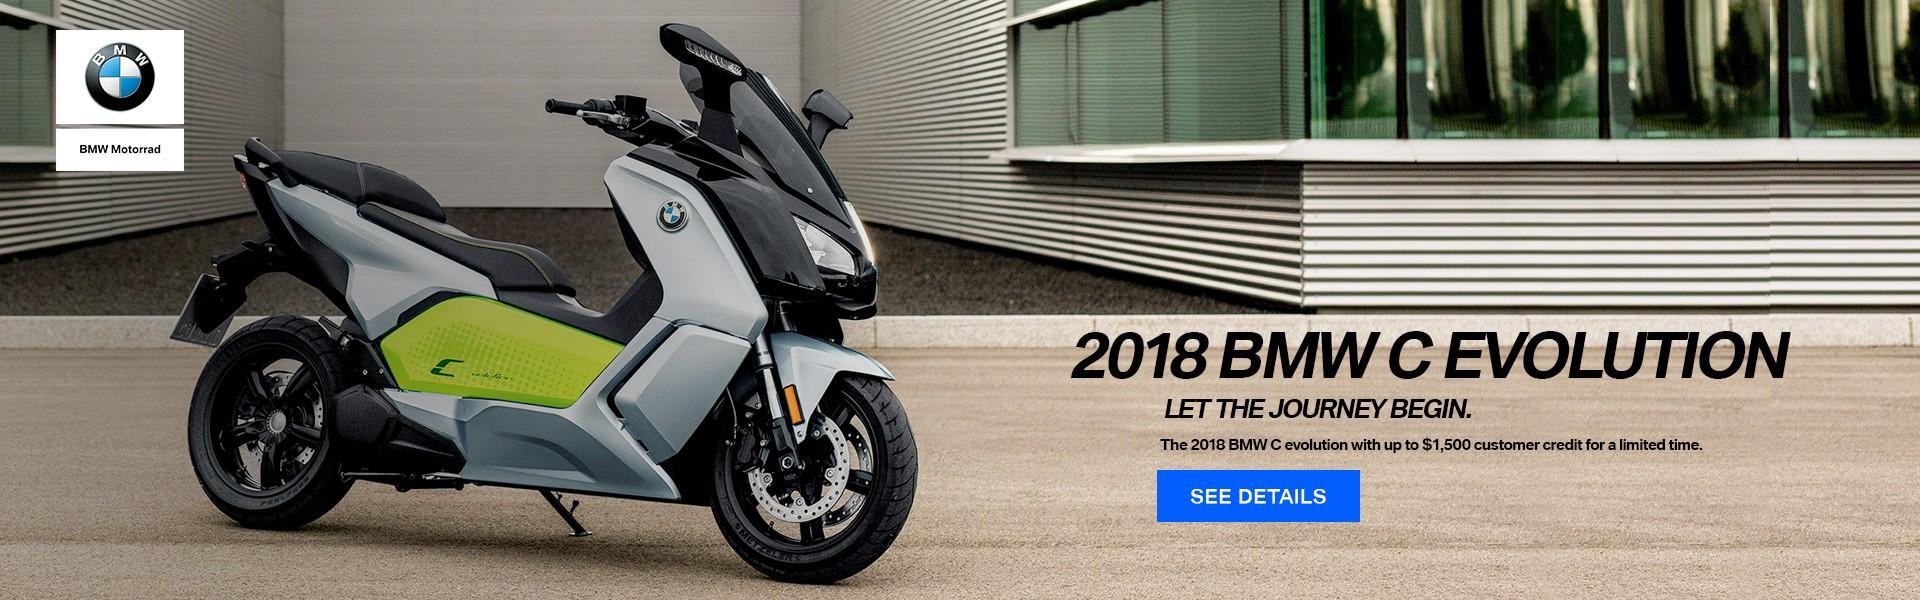 2018 BMW C EVOLUTION